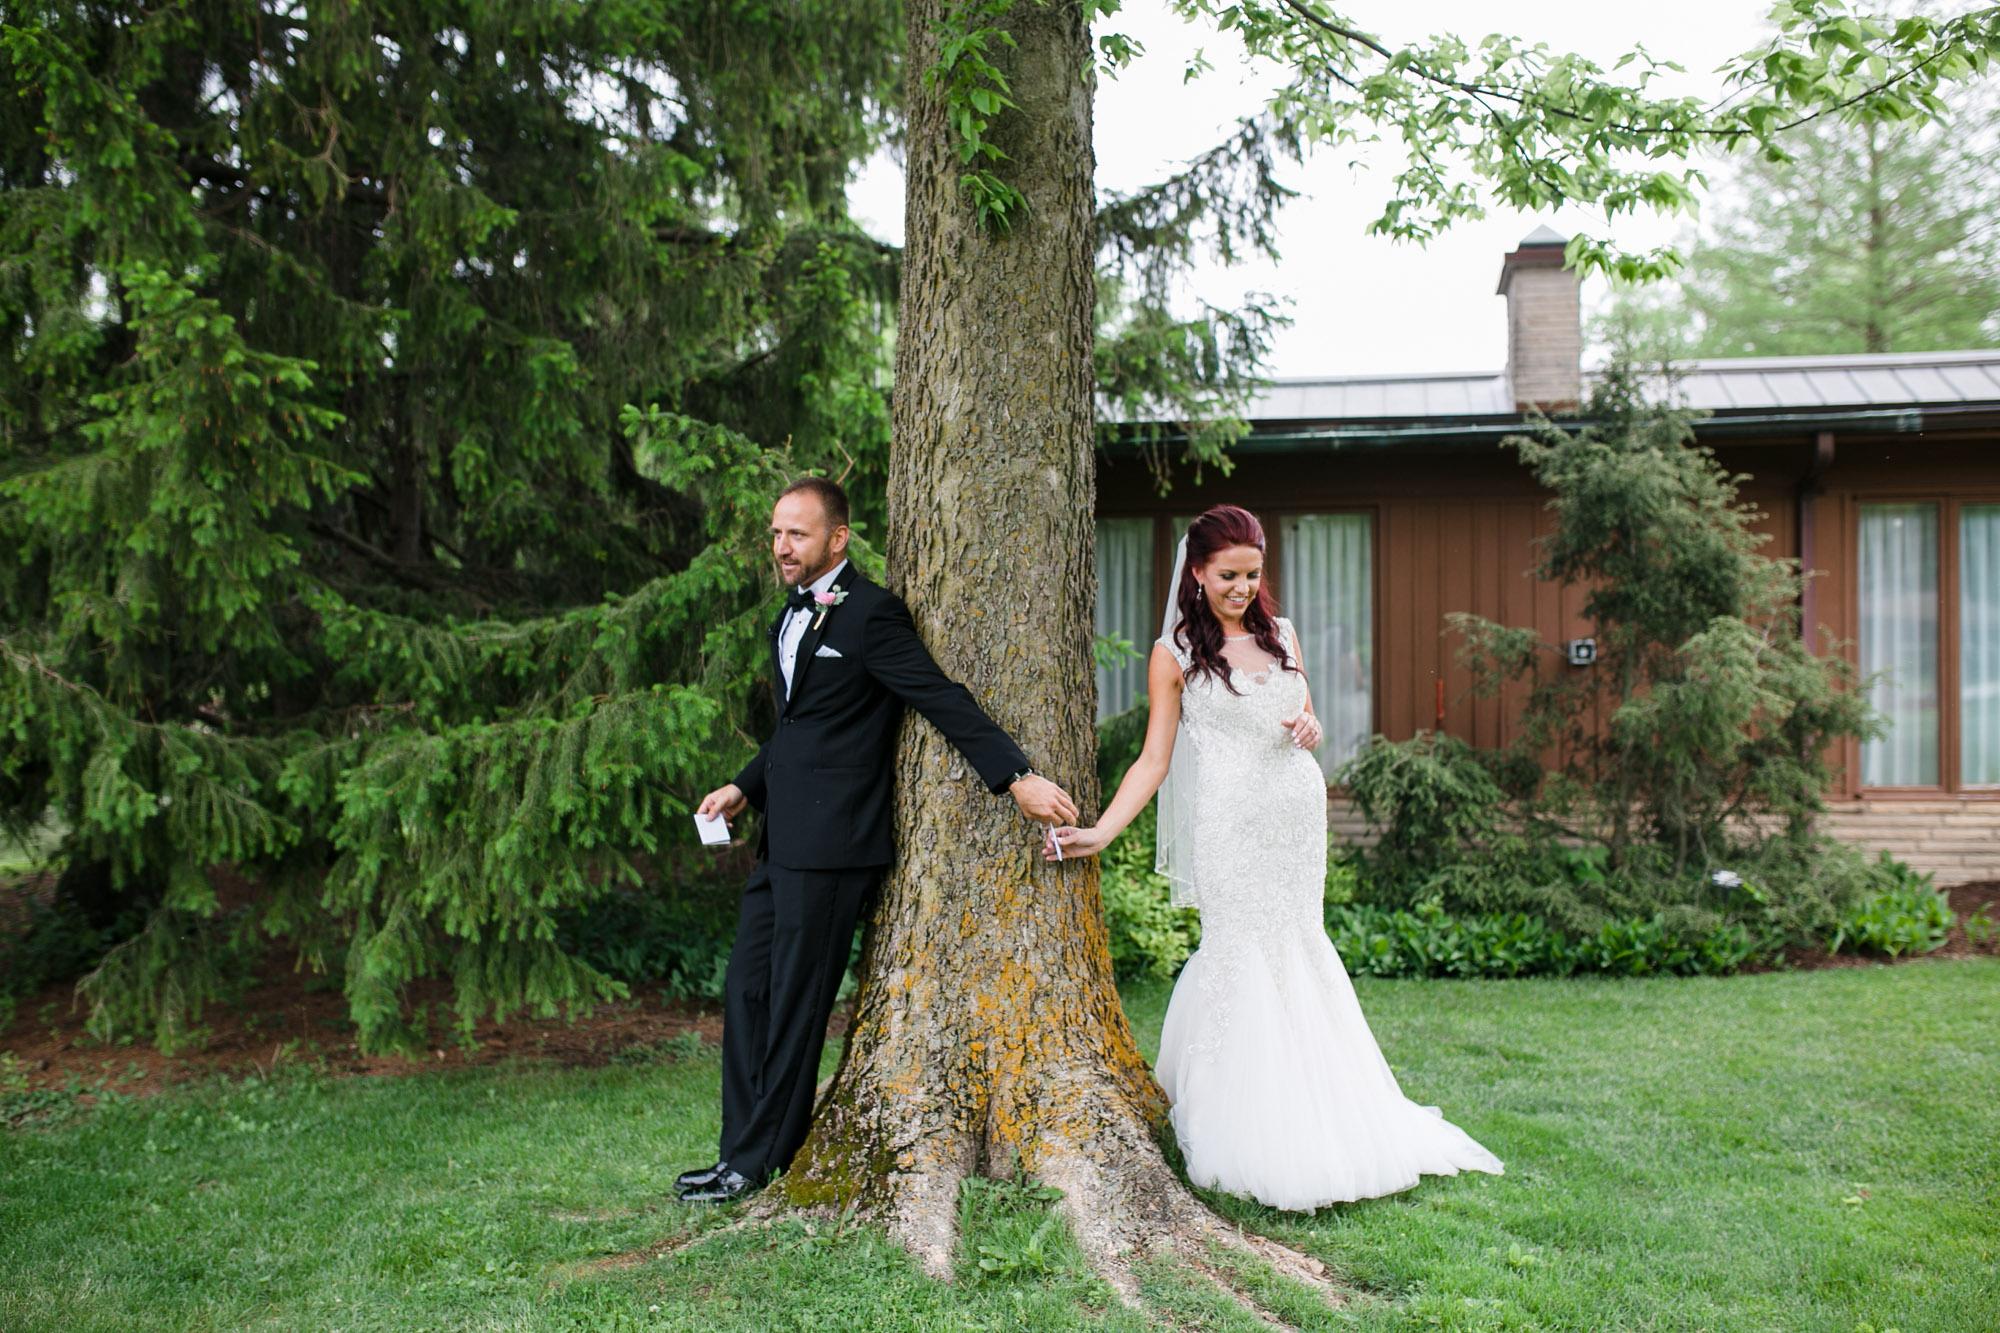 hensville-wedding-downtown-toledo-ohio (25 of 103).jpg